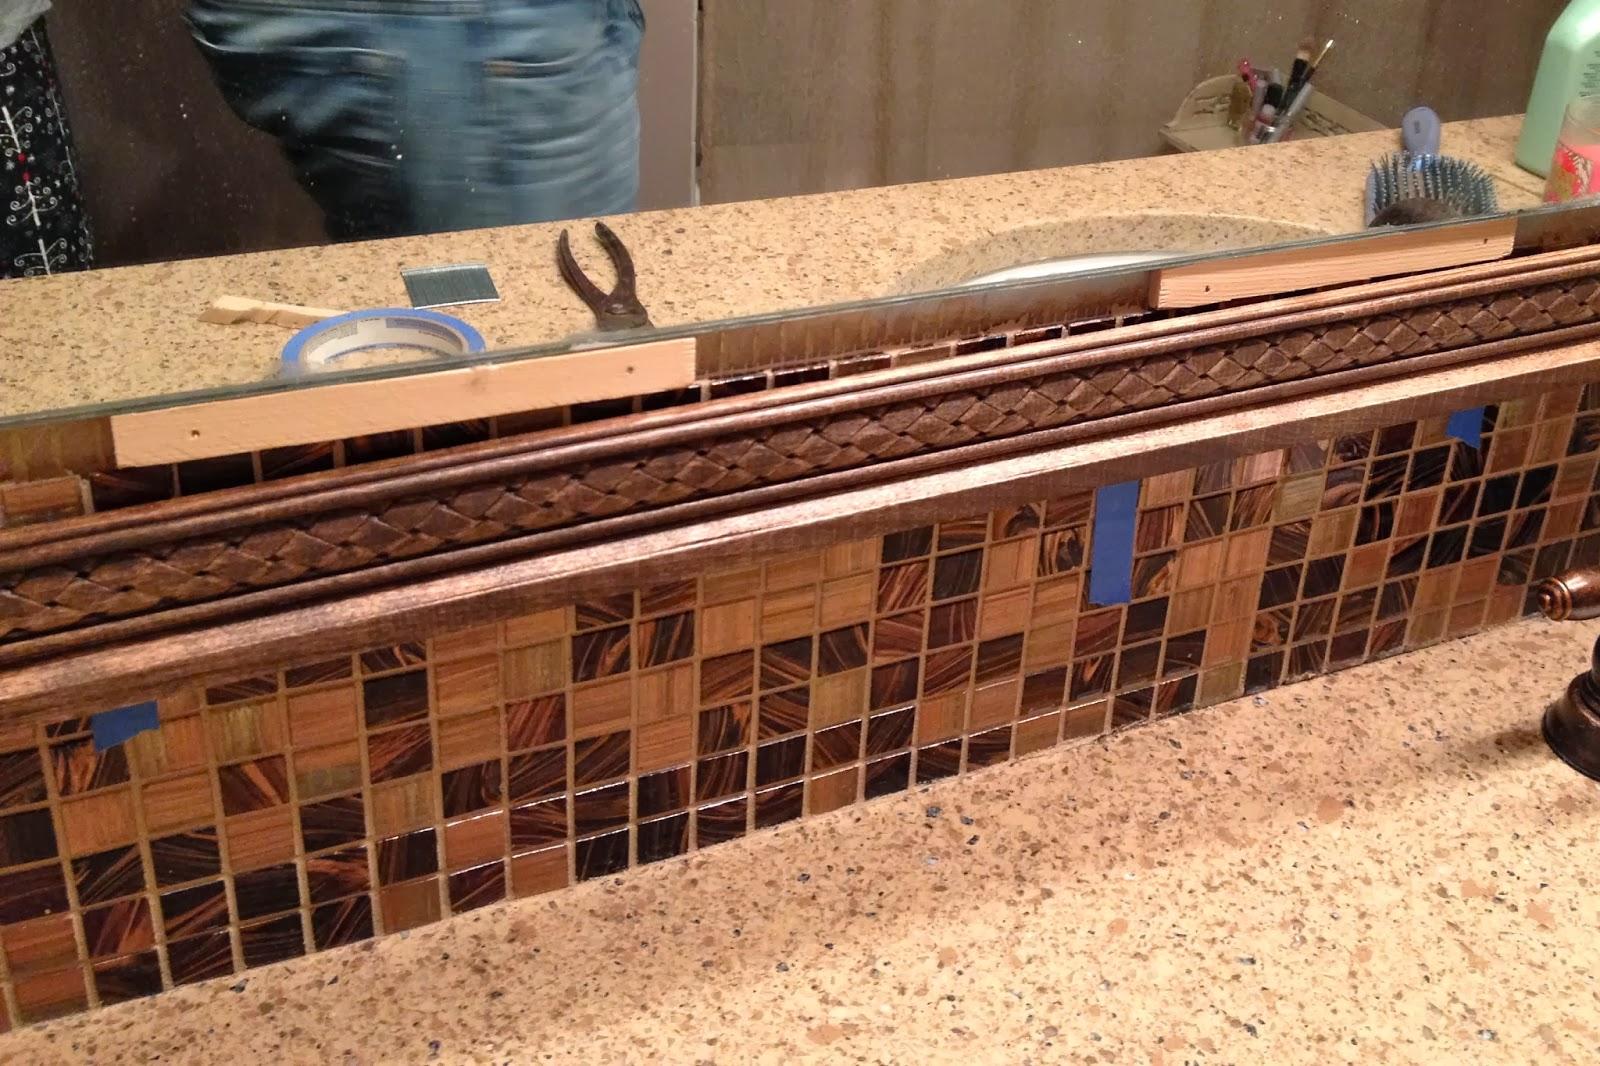 Bathroom Mirror Decorative Trim diy why spend more: decorative trim on bathroom mirror